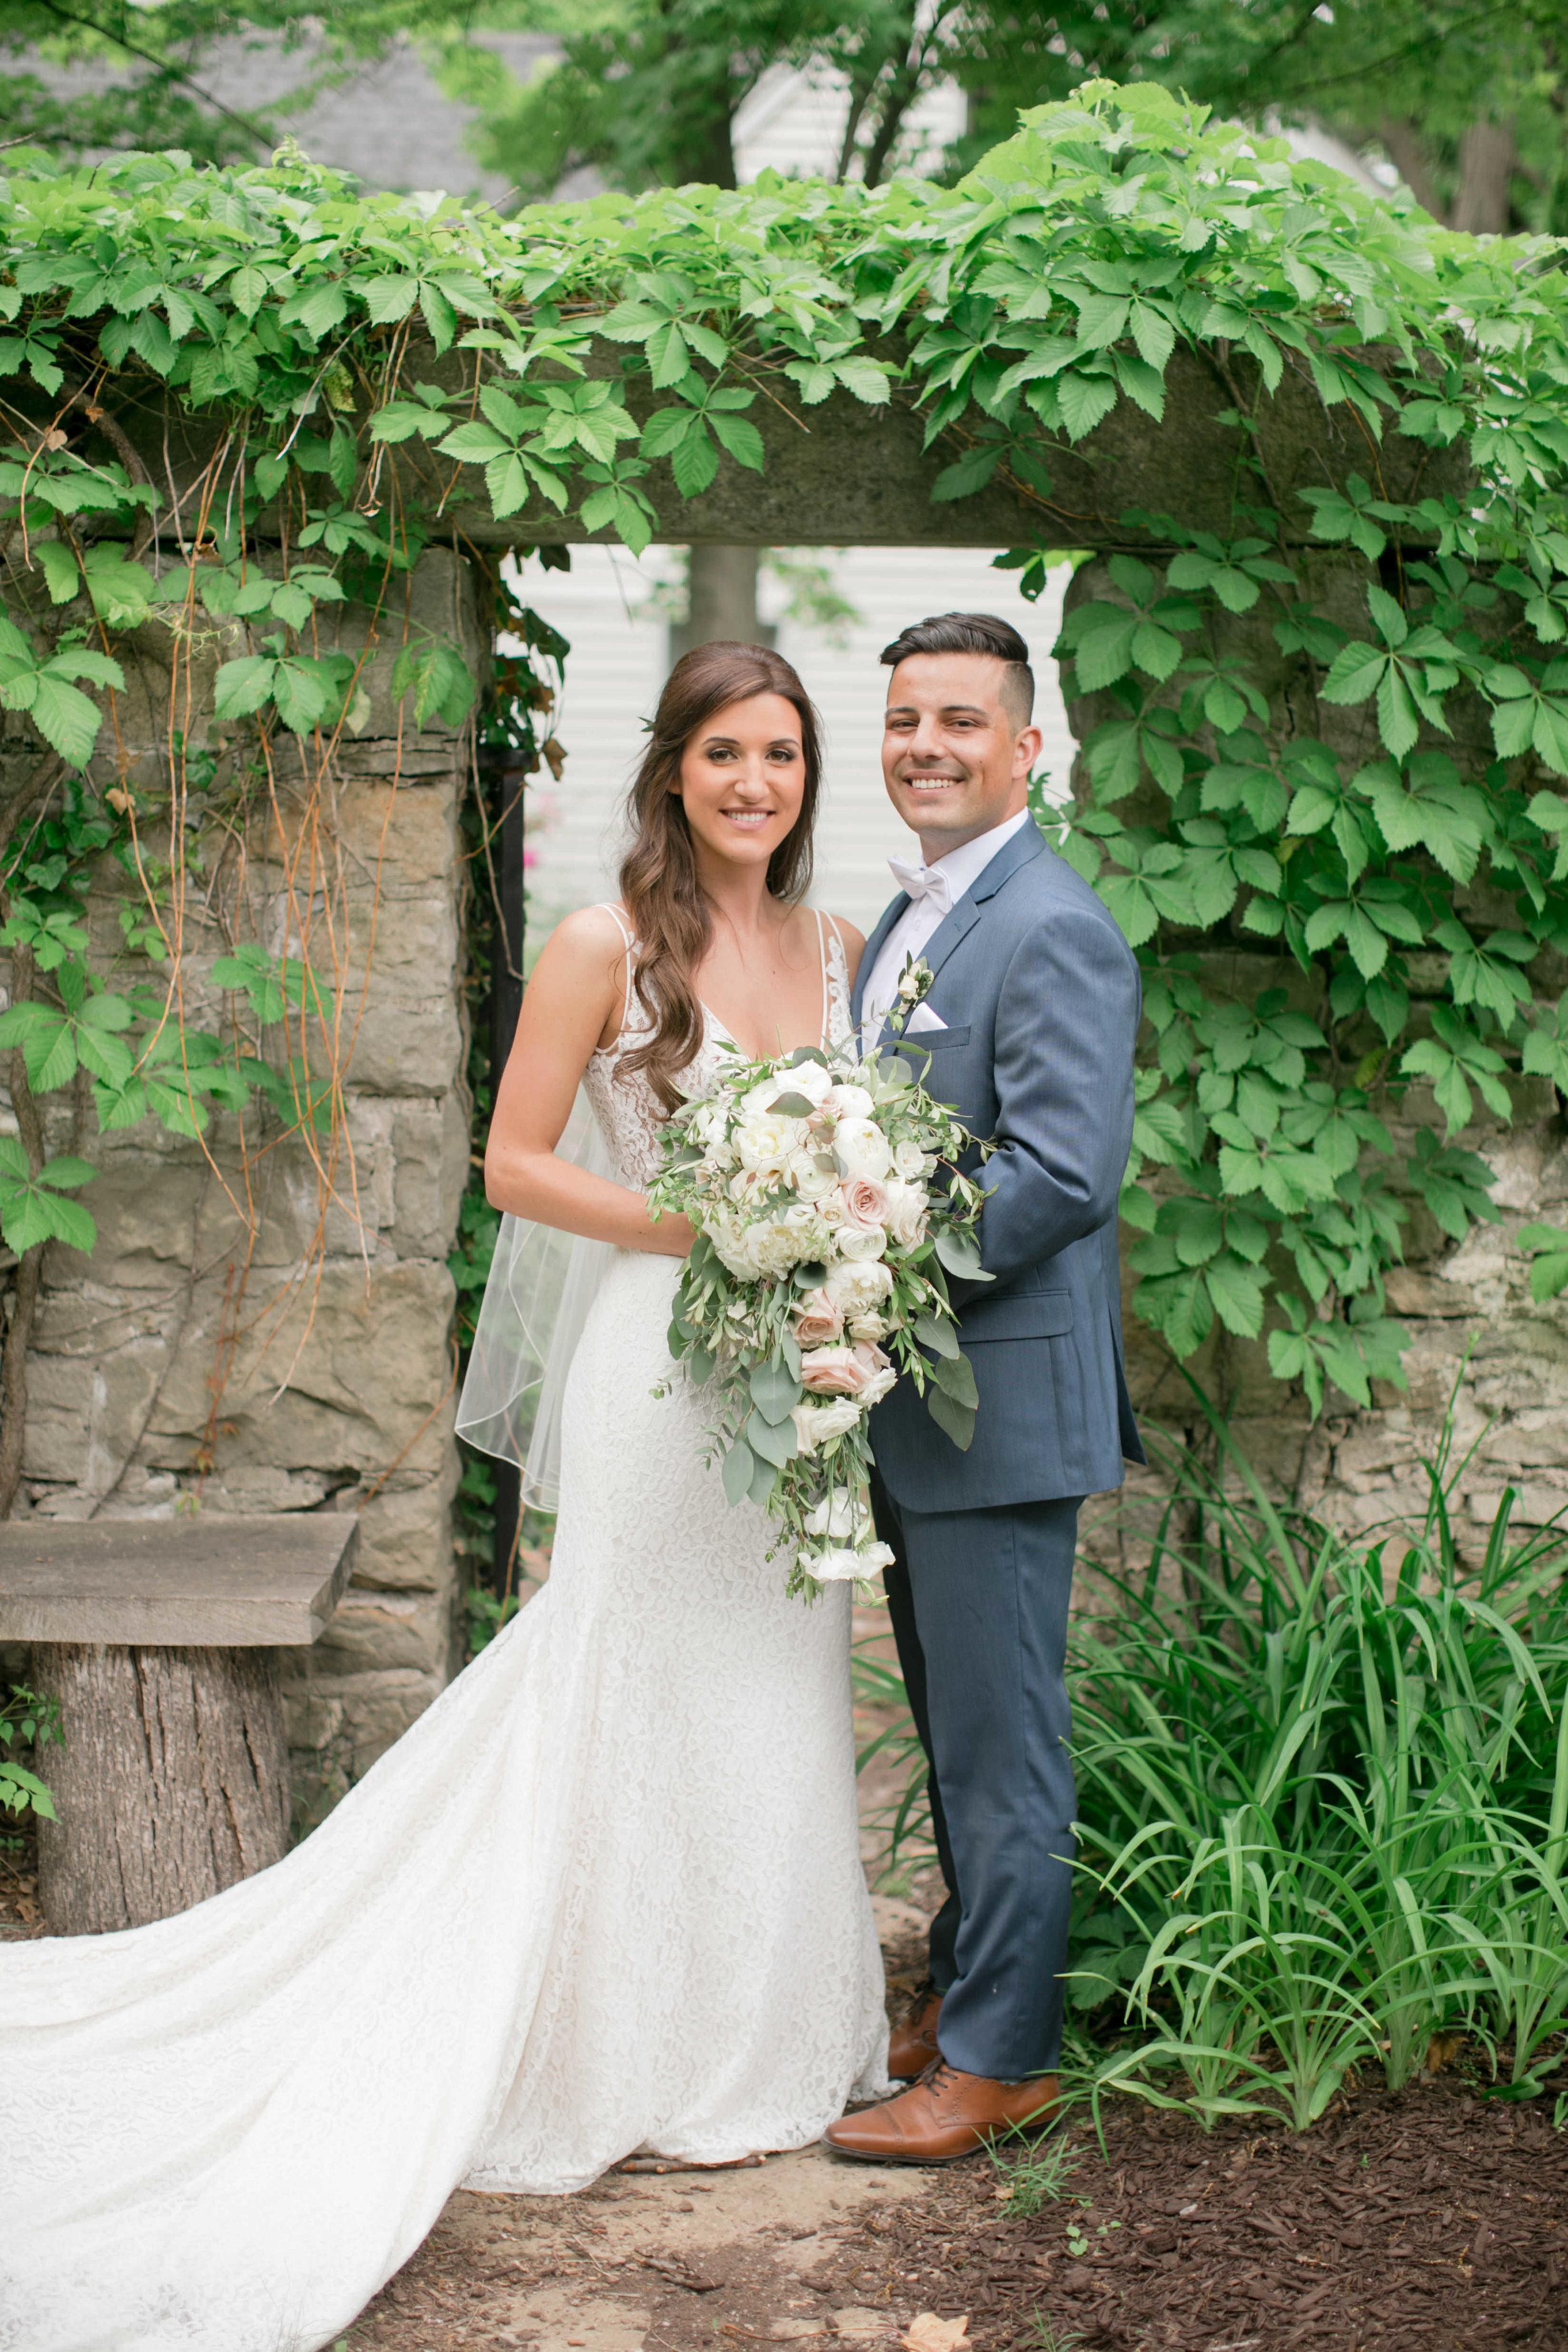 Miranda___Daniel___Daniel_Ricci_Weddings___High_Res._Finals_415.jpg